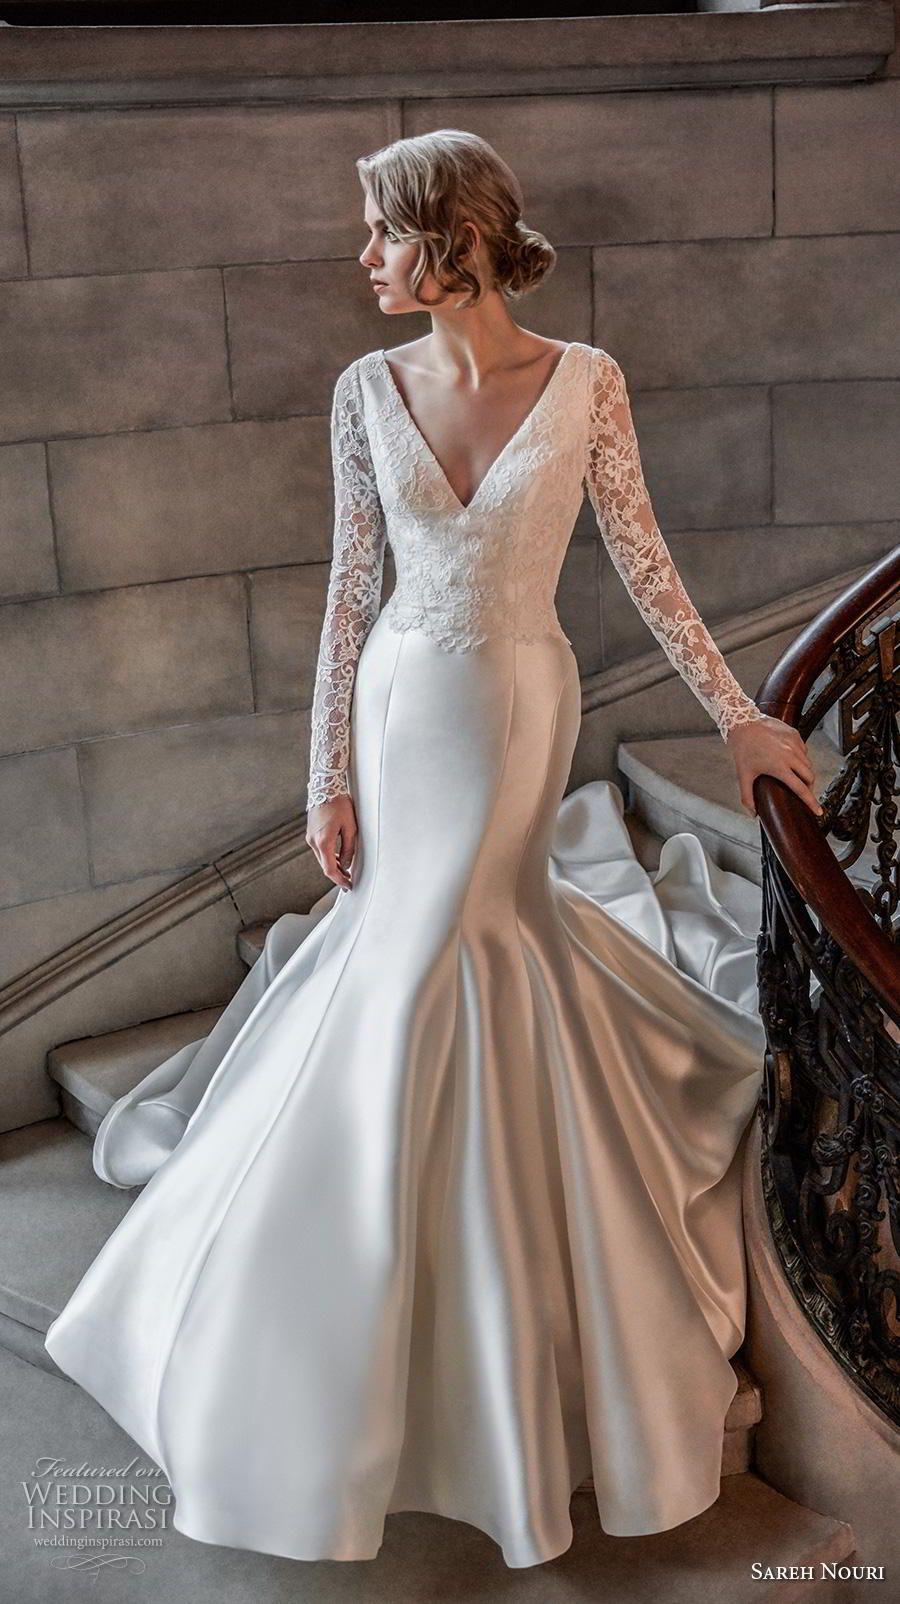 Sareh Nouri Spring 2020 Wedding Dresses The Royal Bridal Collection Wedding Inspirasi Ethereal Wedding Dress Sareh Nouri Wedding Dress Maxi Dress Wedding